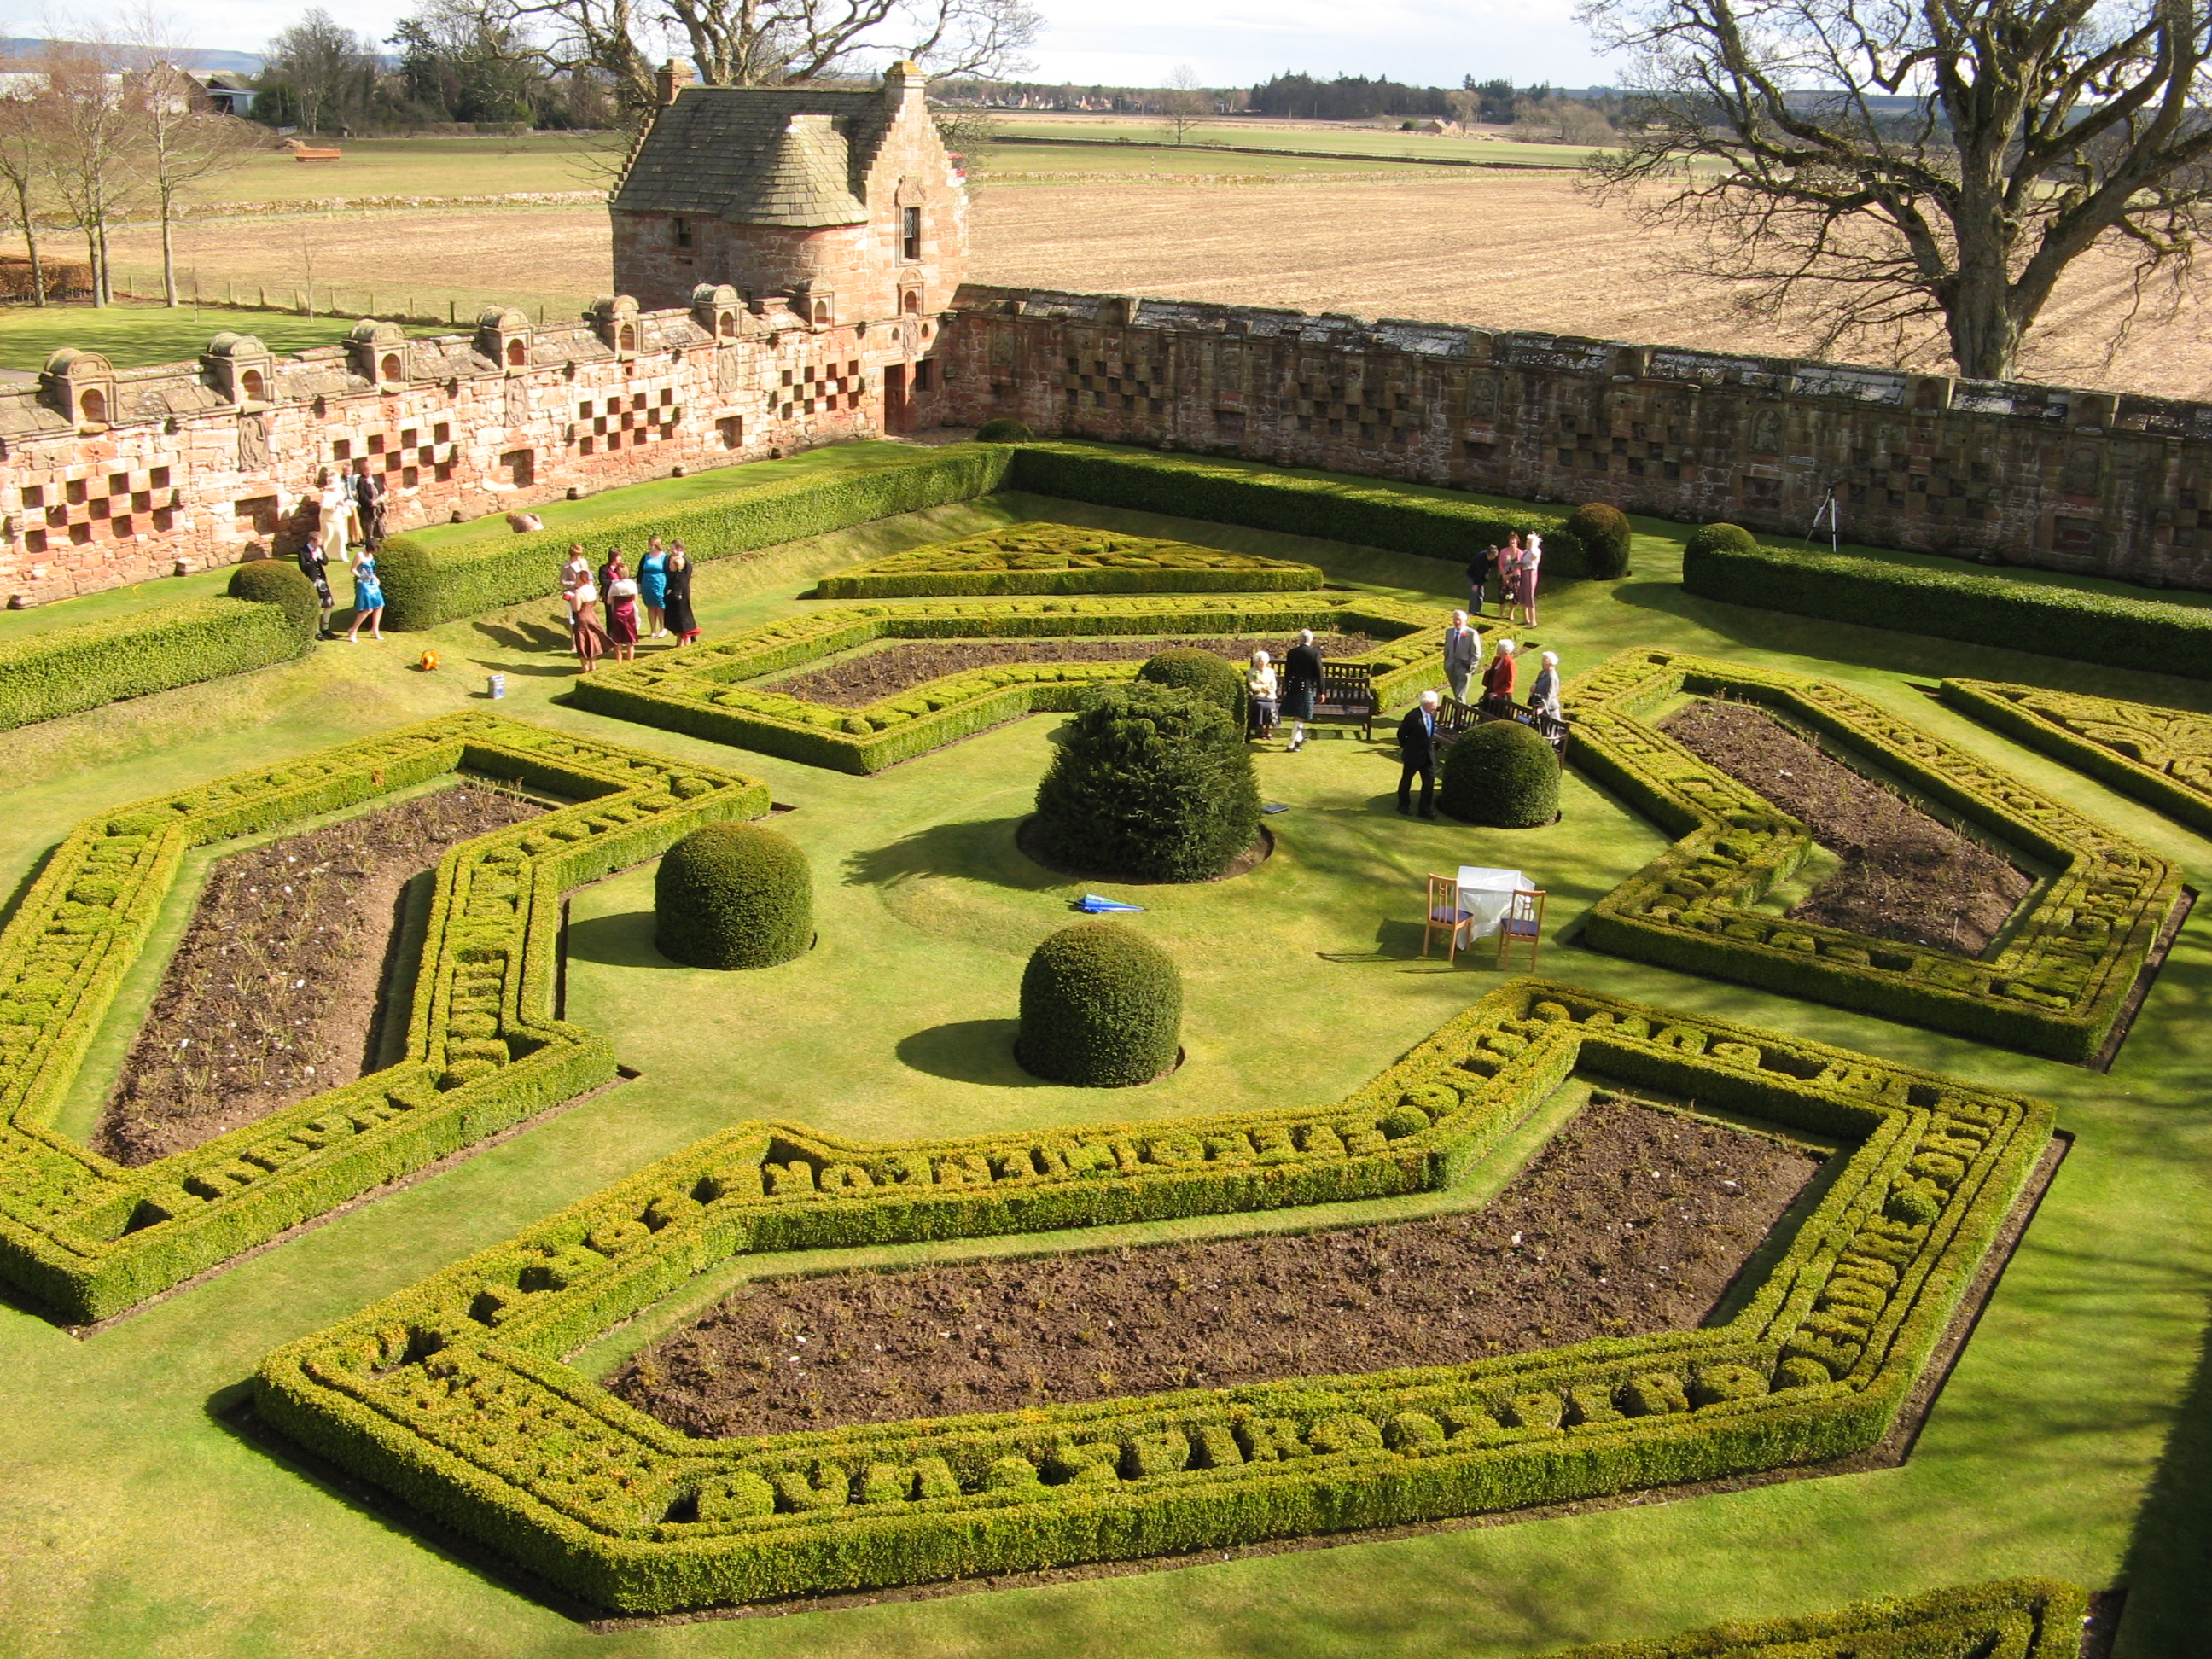 Walled garden - Wikipedia